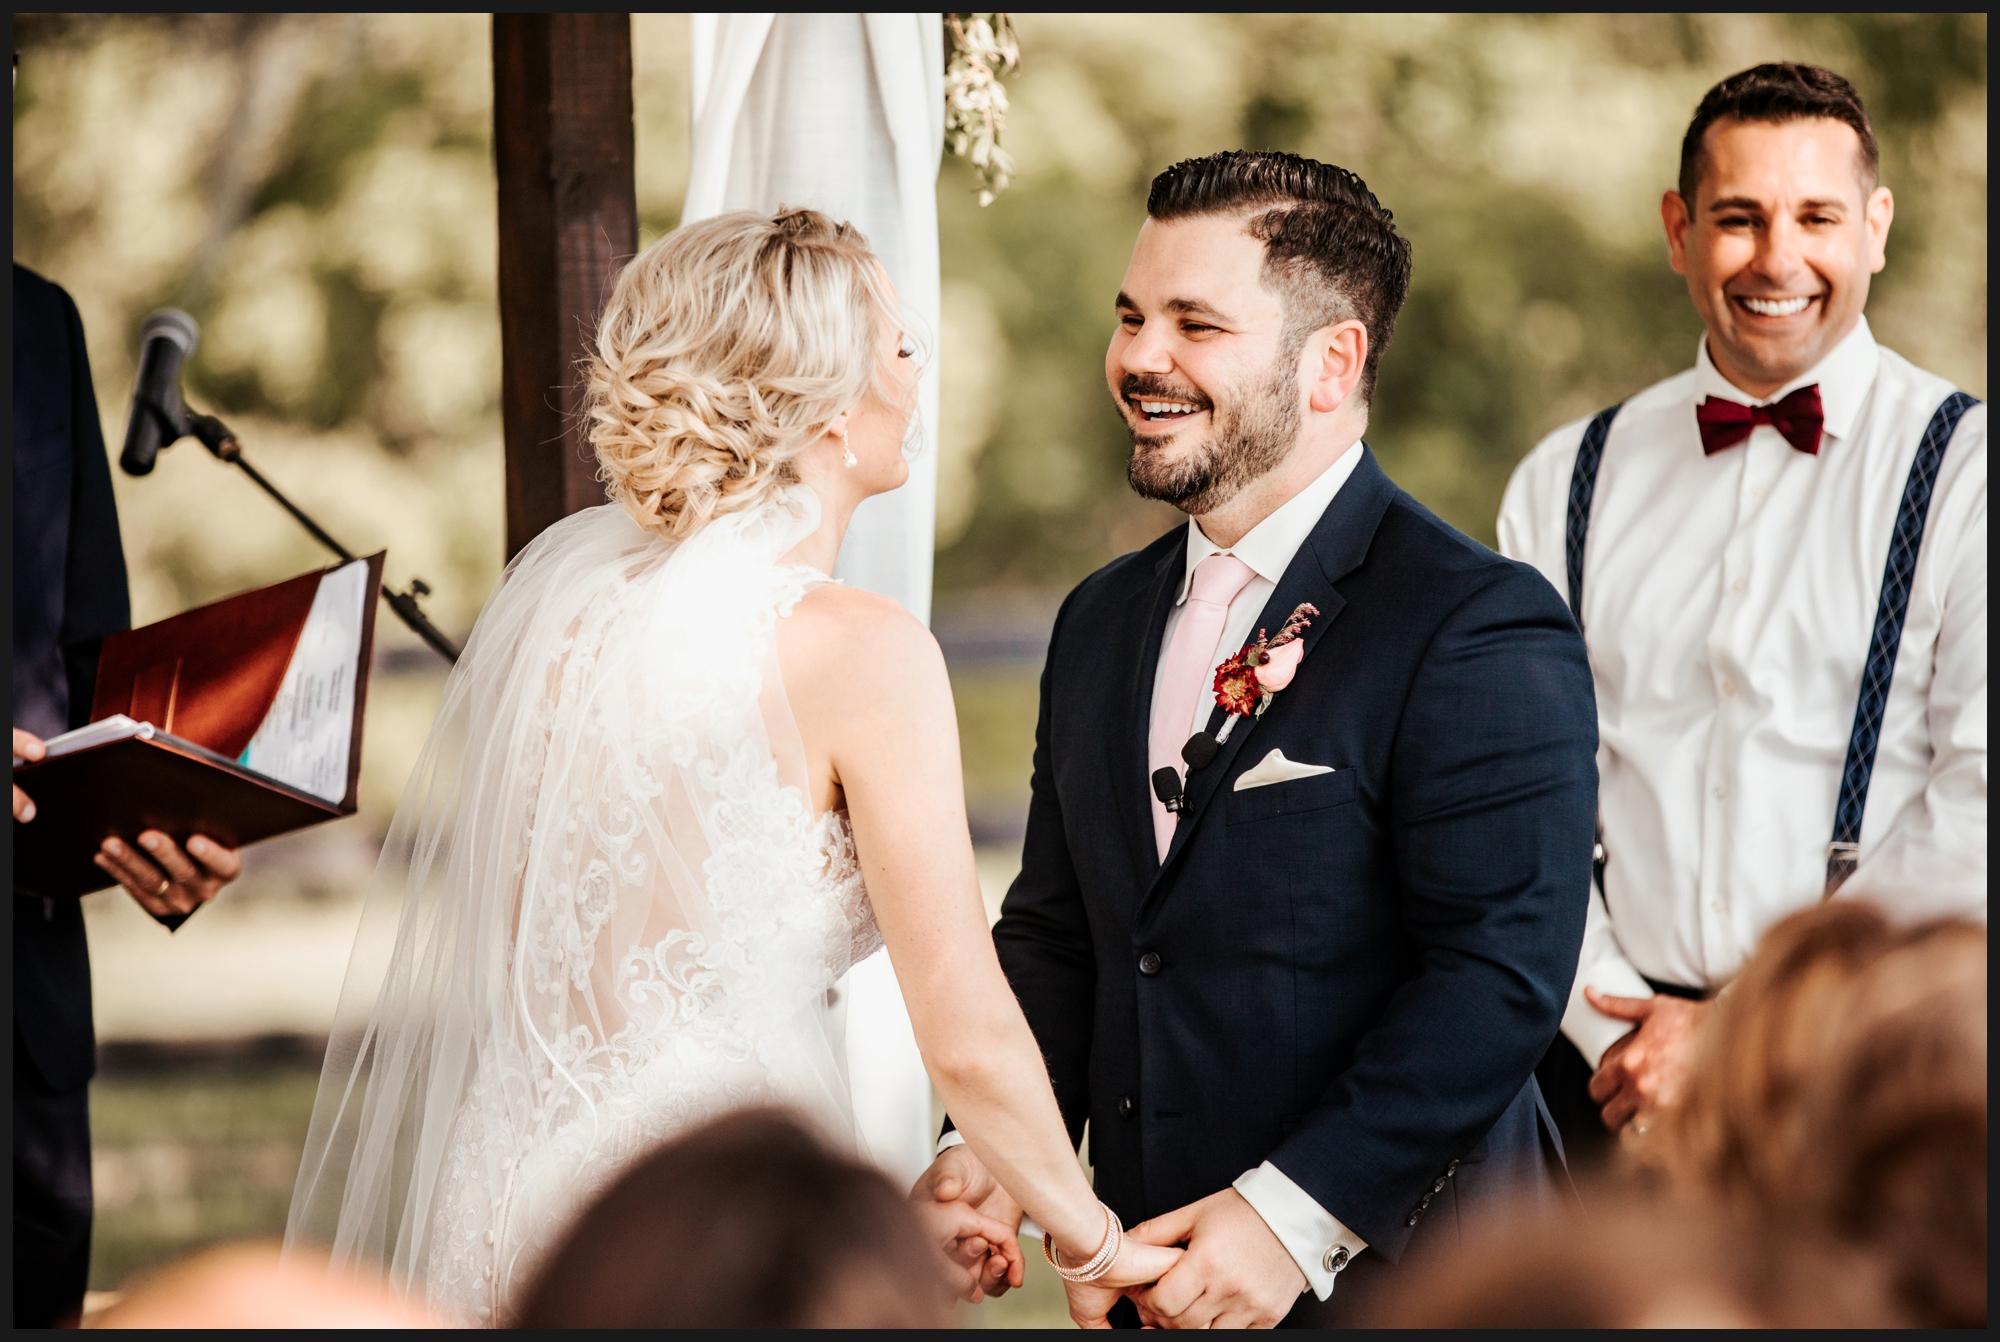 Orlando-Wedding-Photographer-destination-wedding-photographer-florida-wedding-photographer-hawaii-wedding-photographer_0596.jpg